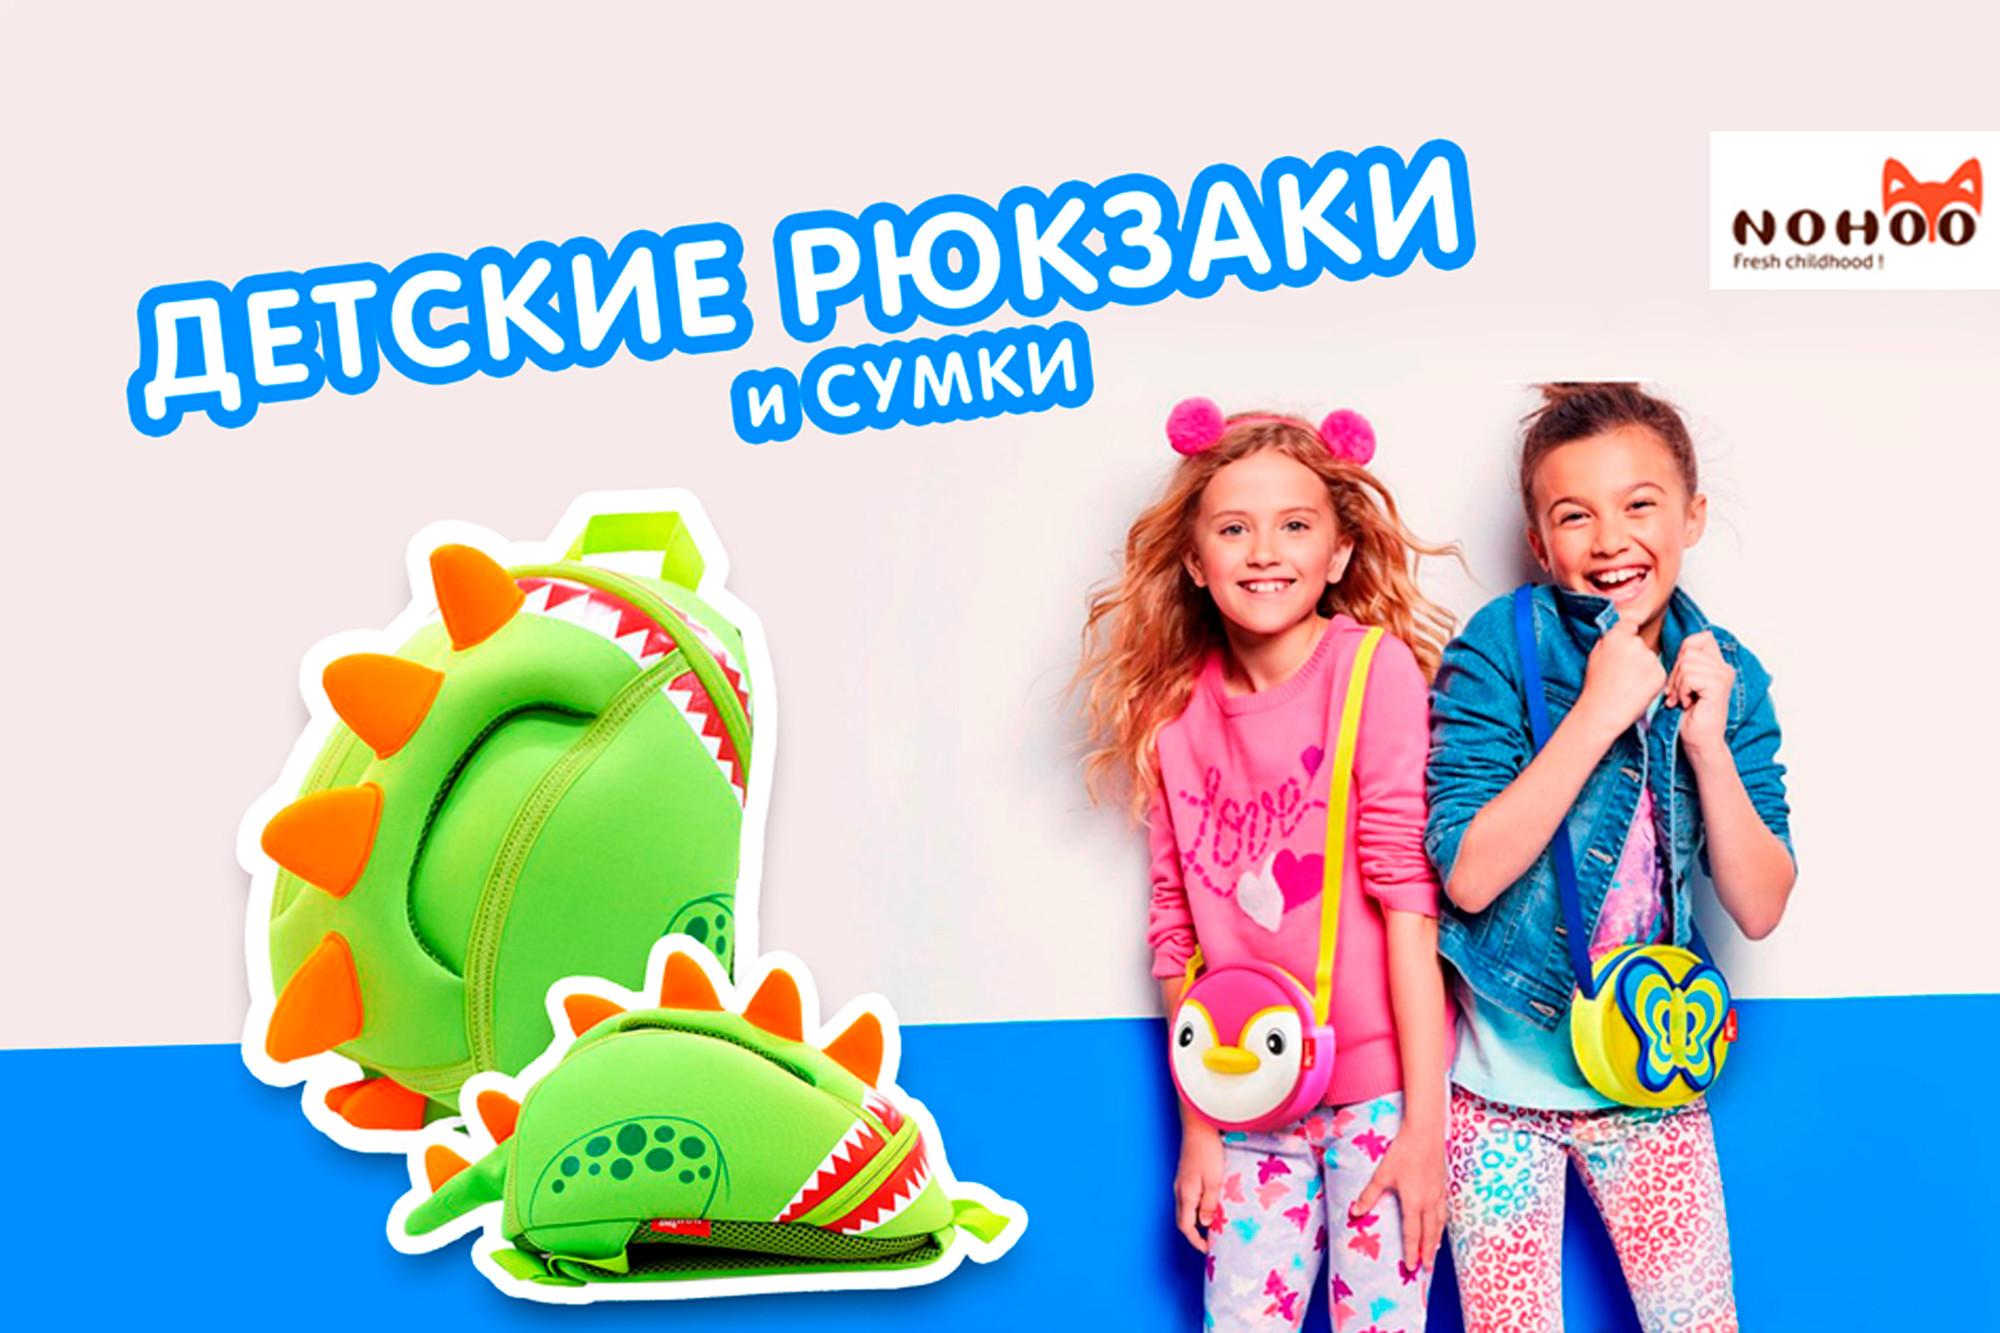 Nohoo детские 3D рюкзаки